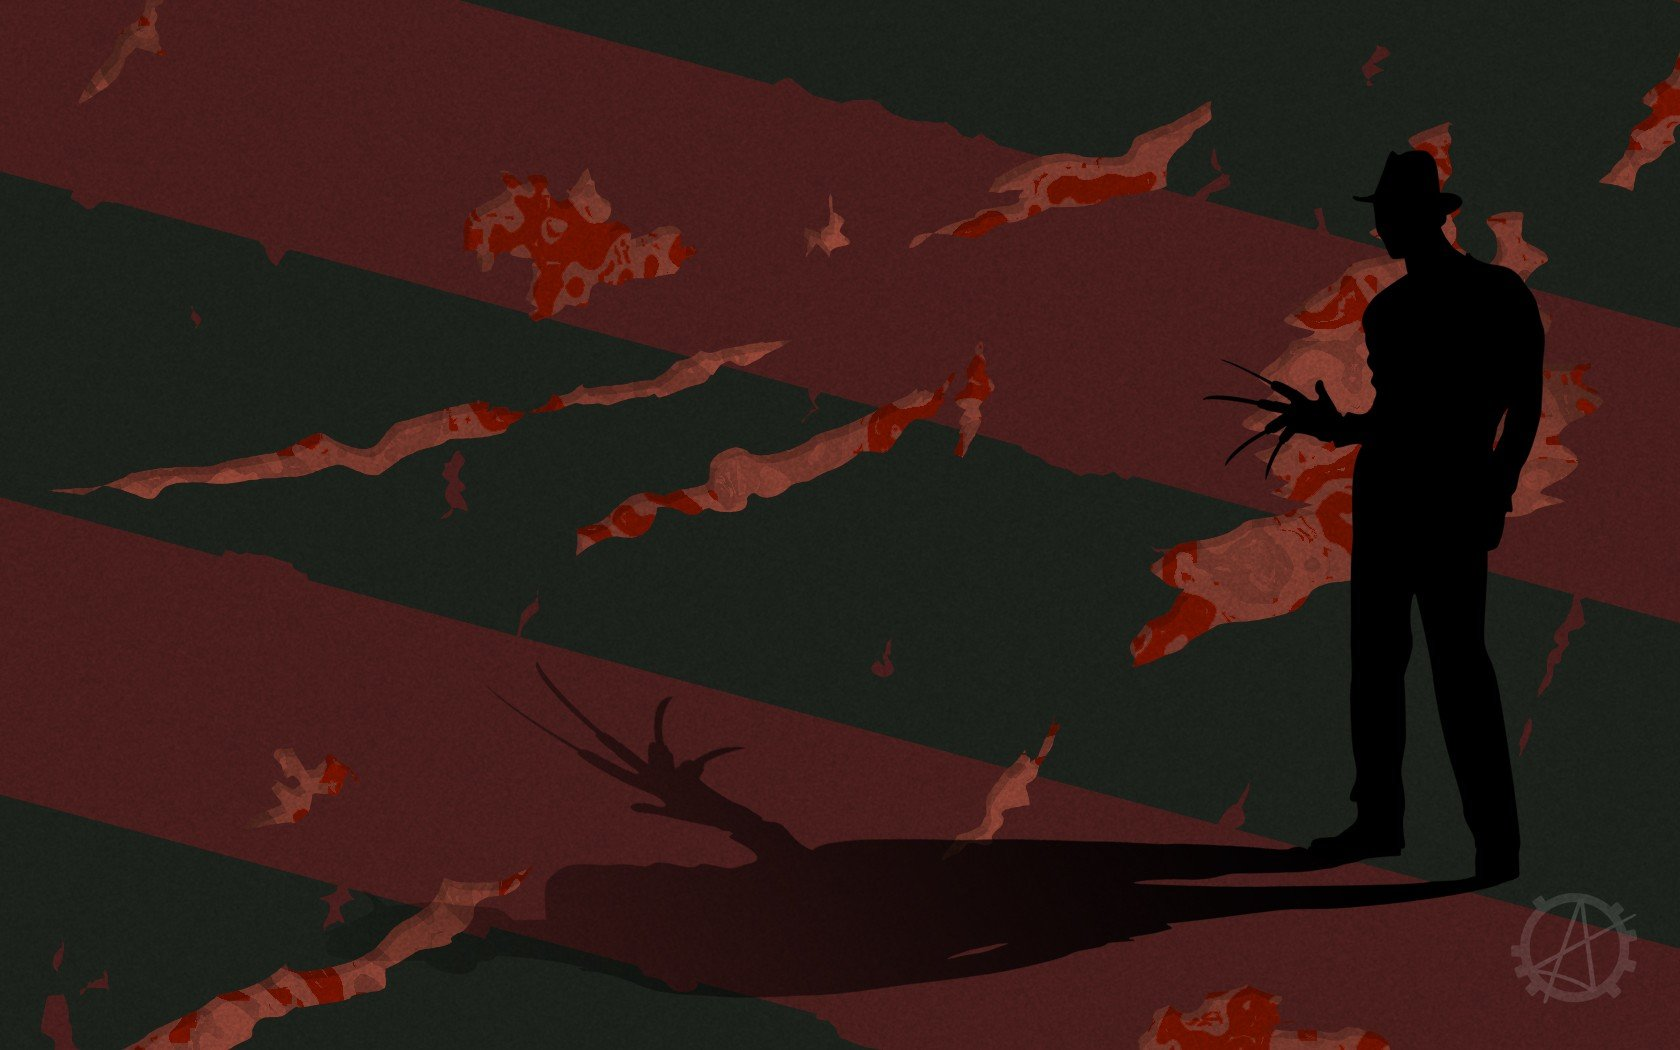 Dark Freddy Krueger wallpaper 1680x1050 261891 WallpaperUP 1680x1050